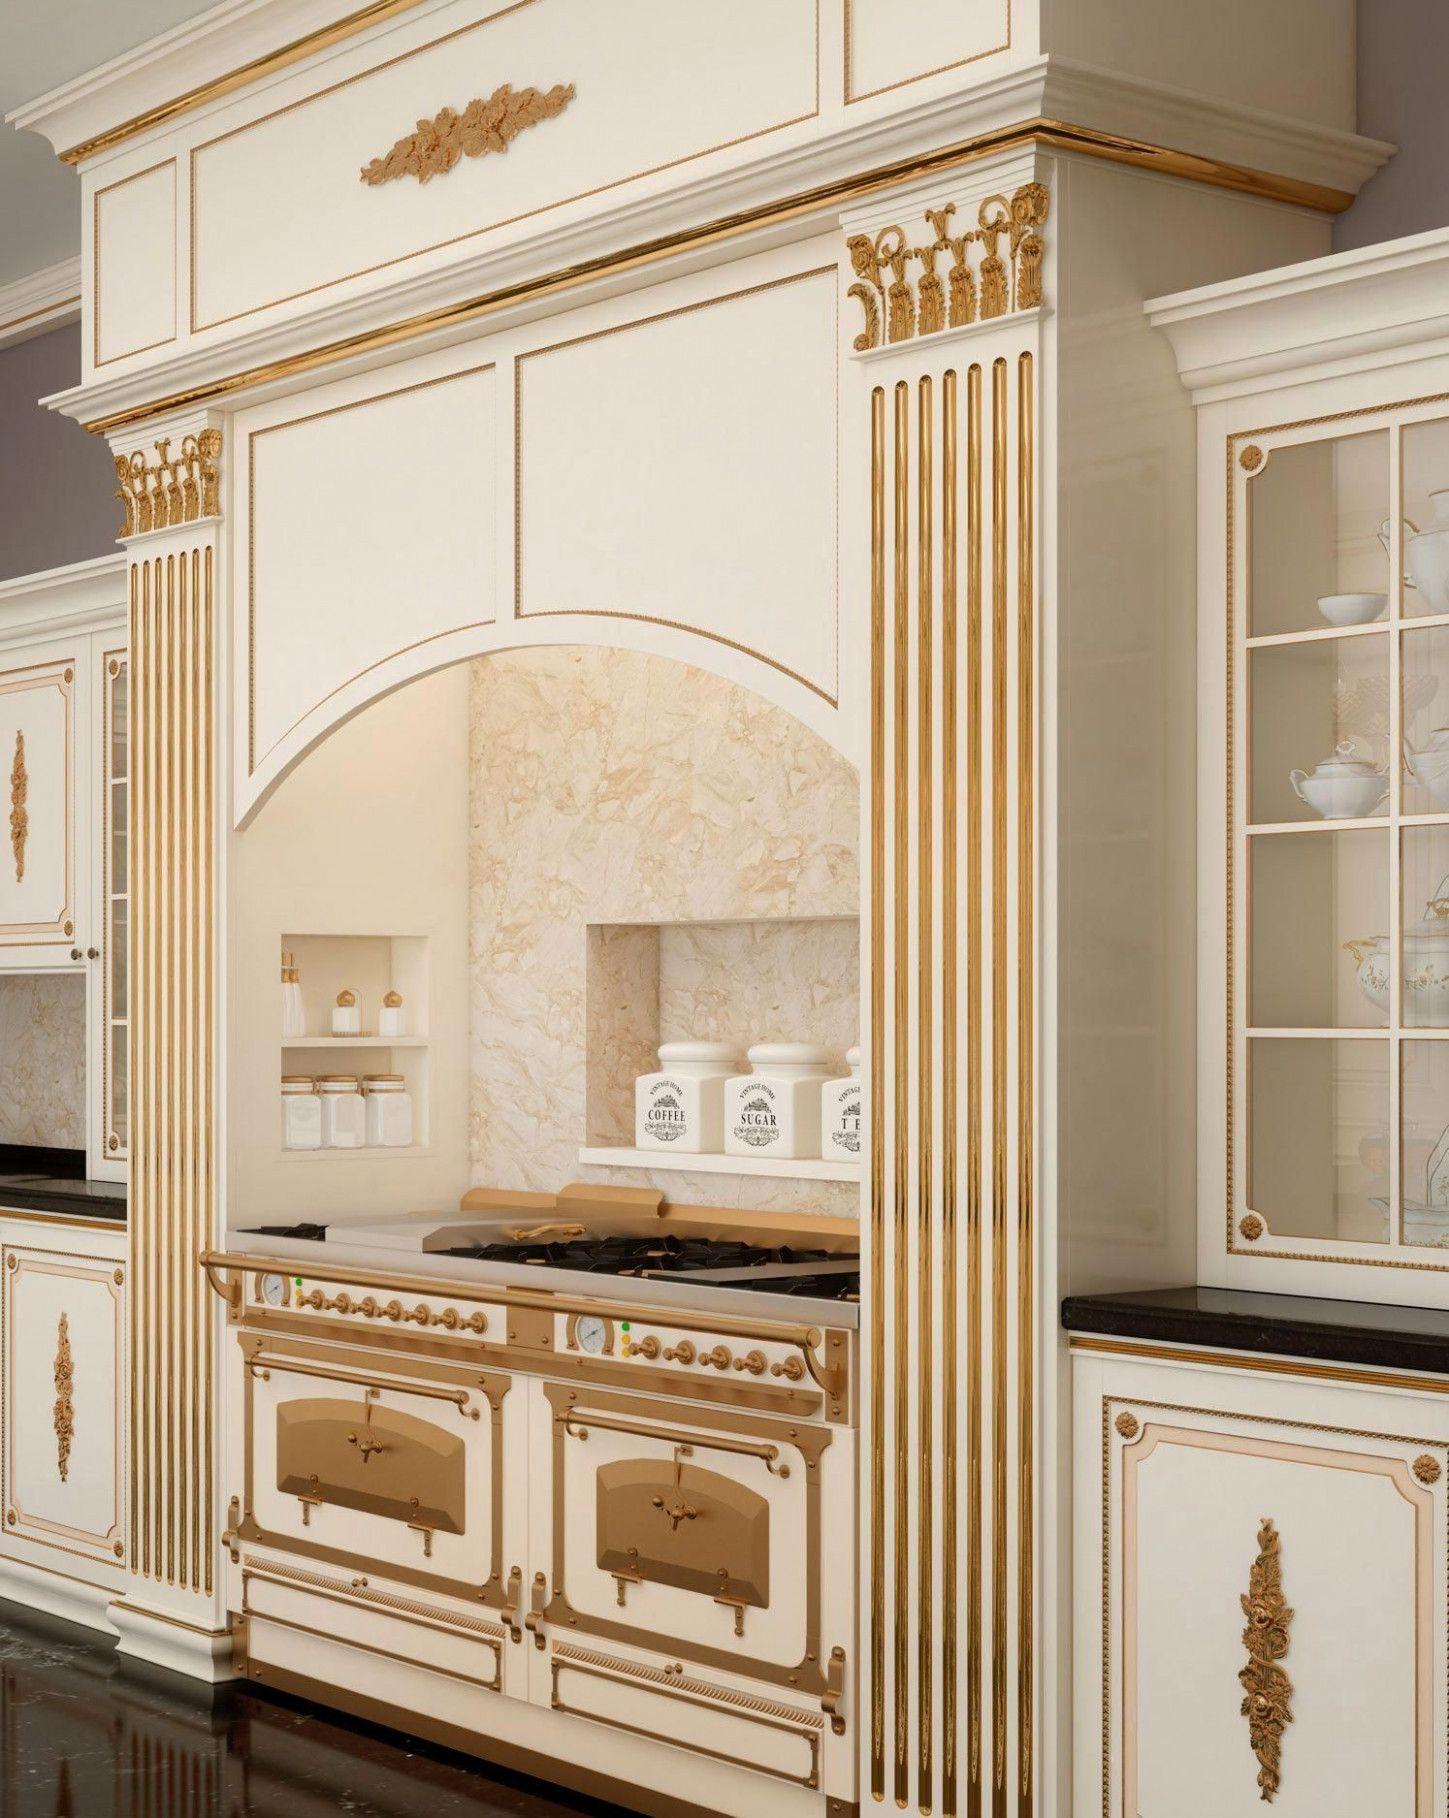 10 Kitchen Cabinet Hardware Leaf Design Mebel Istana